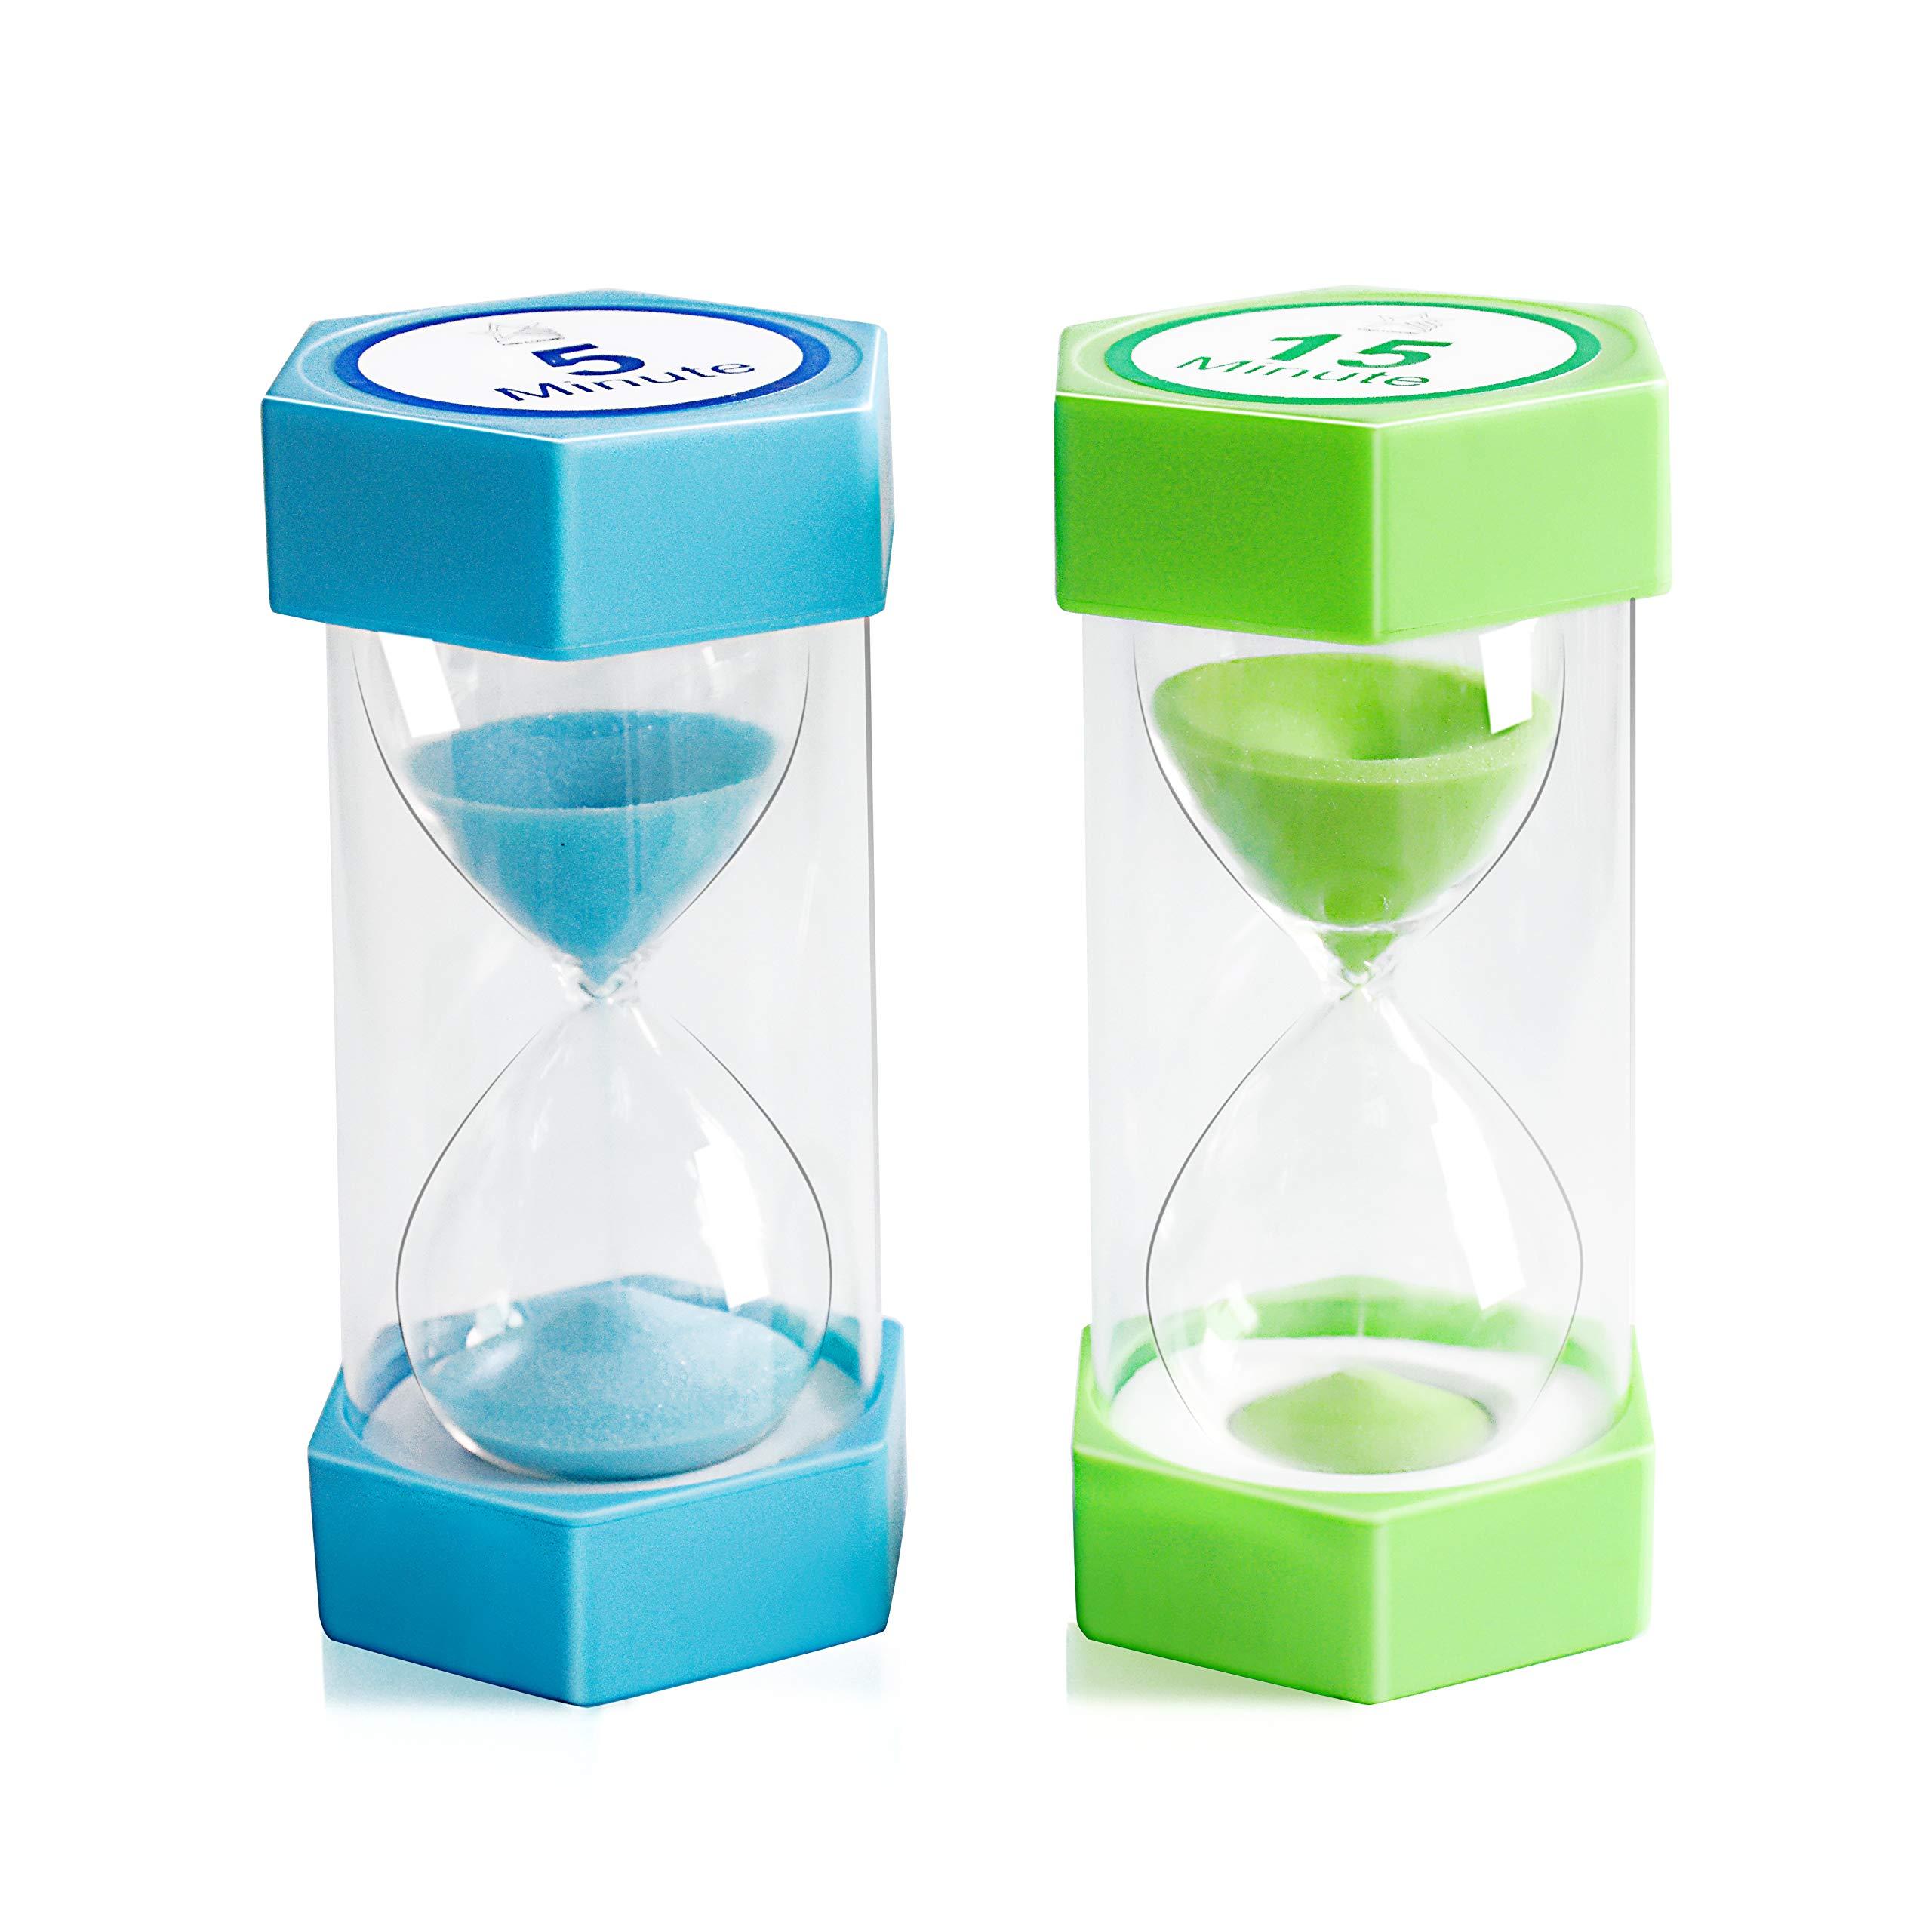 XINBAOHONG Hourglass Minutes Classroom Kitchen